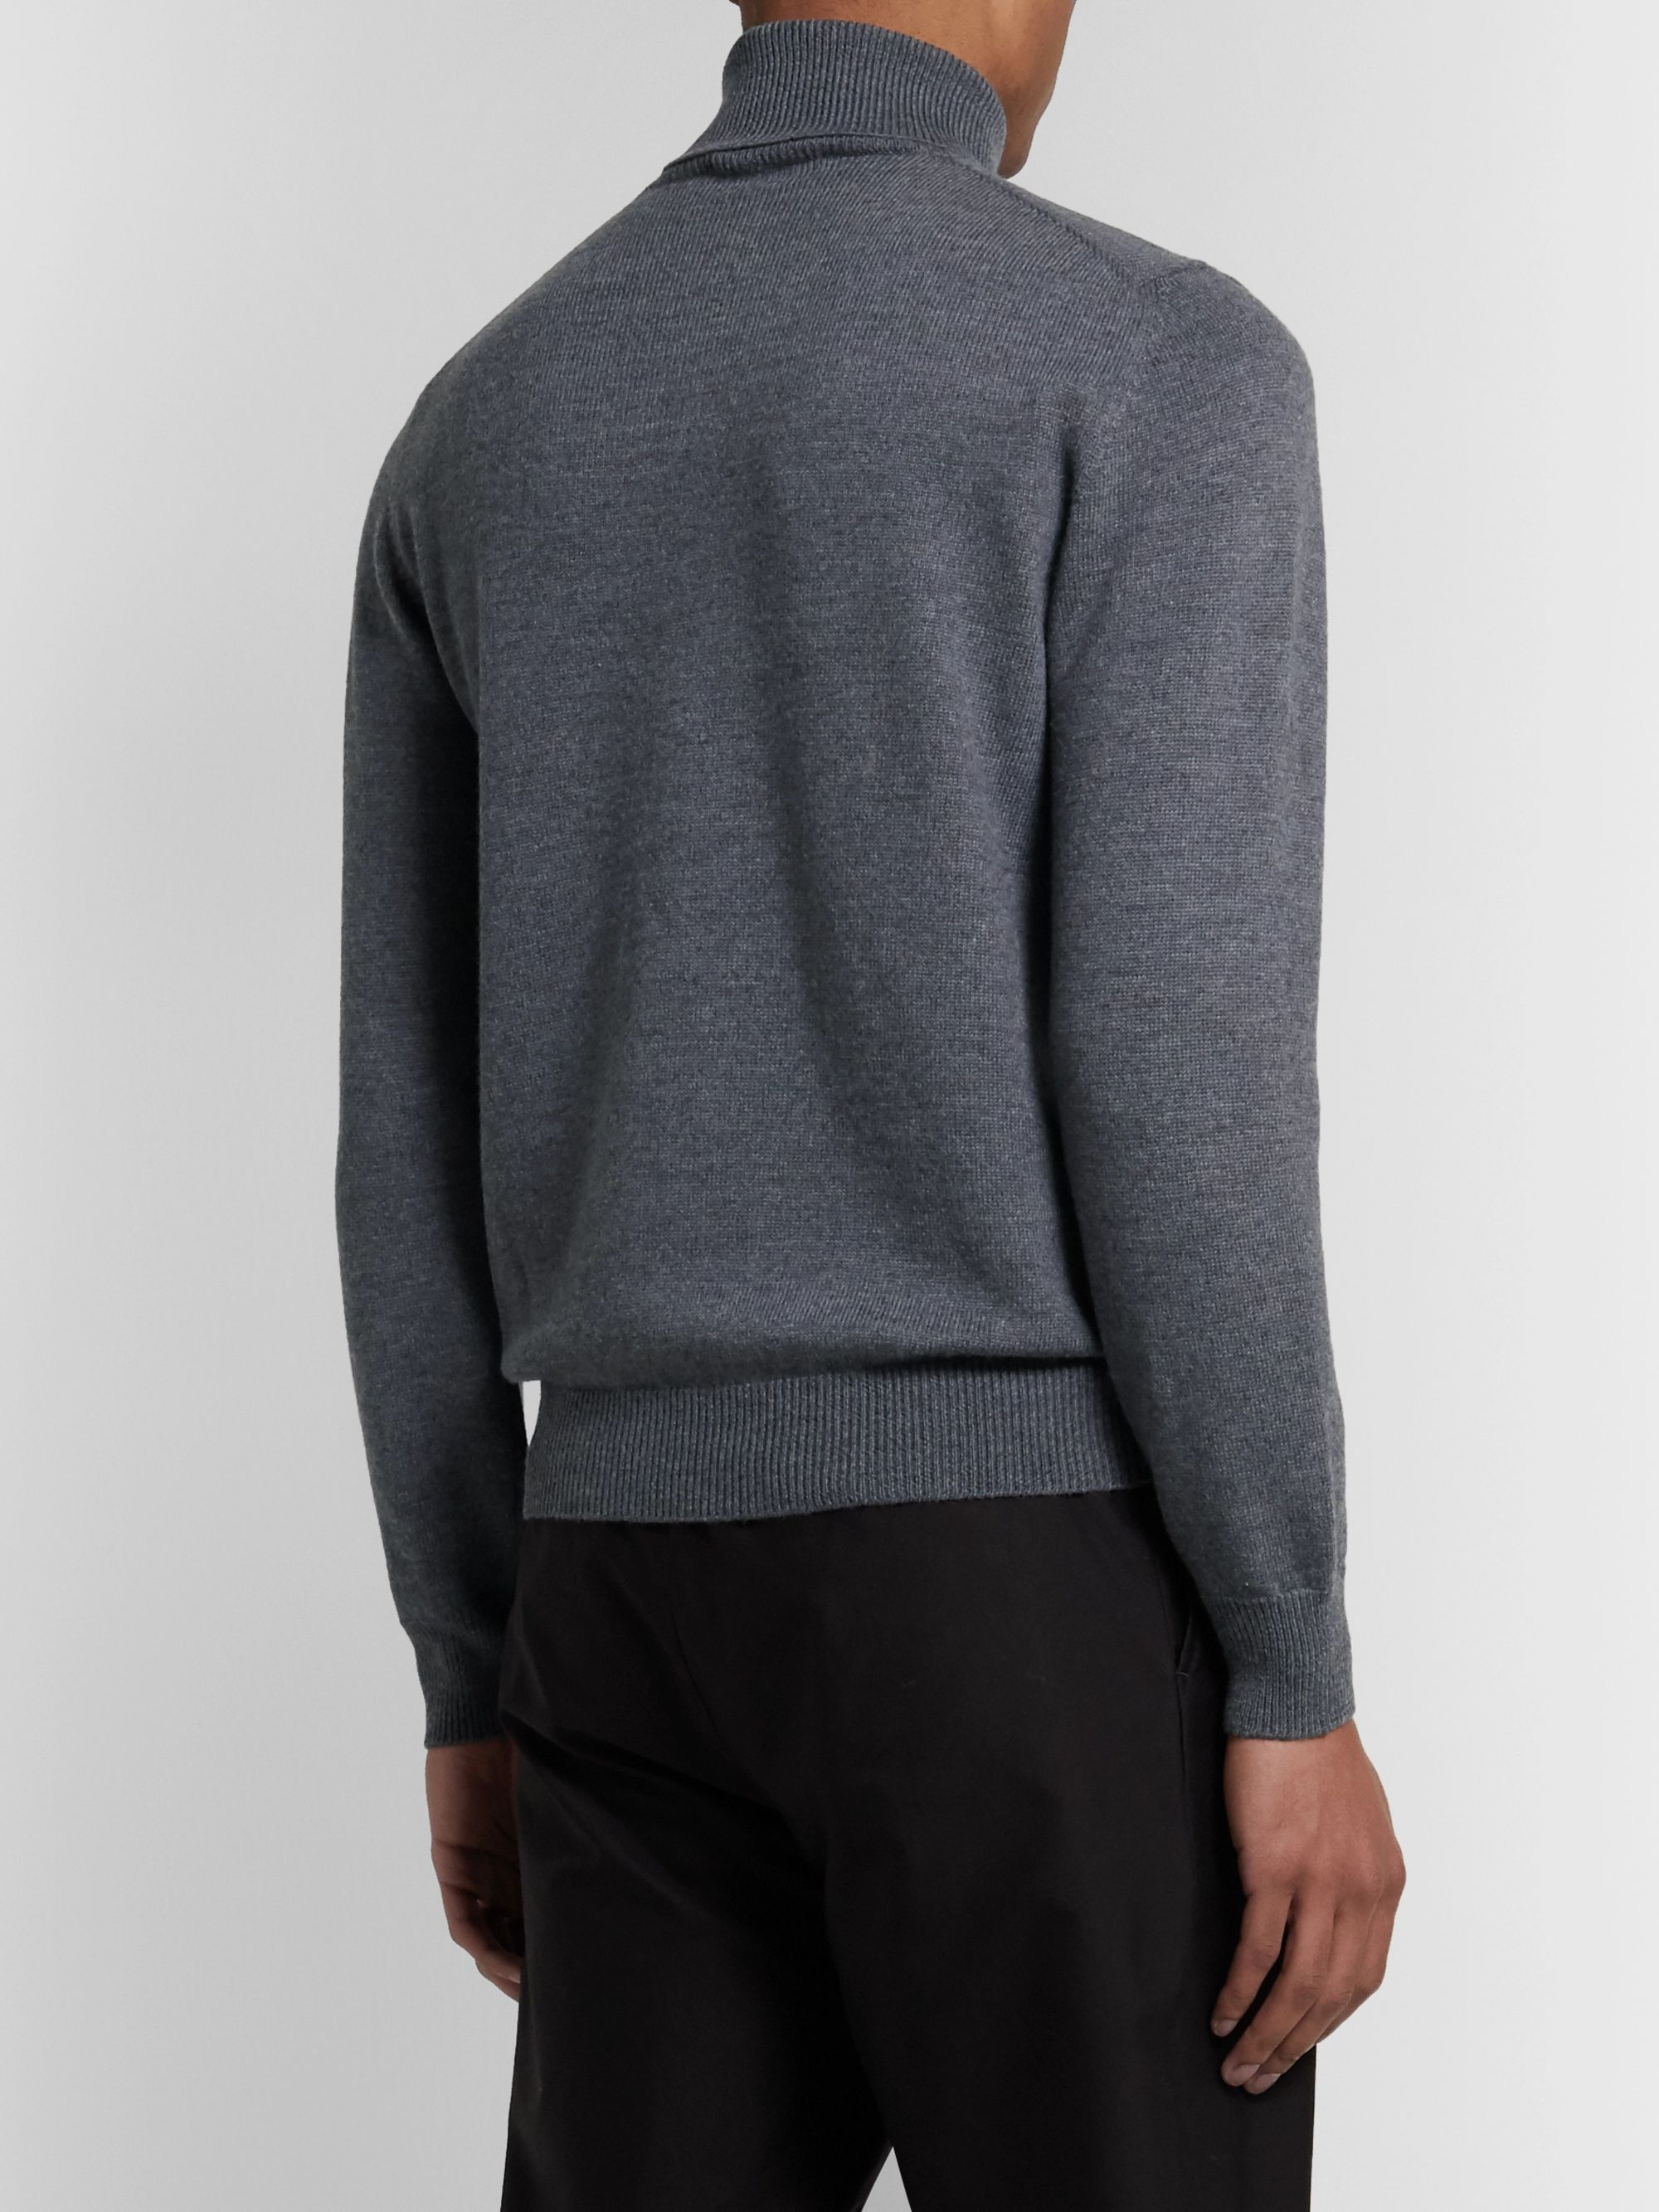 Dark Gray Mélange Merino Wool Rollneck Sweater | Saman Amel